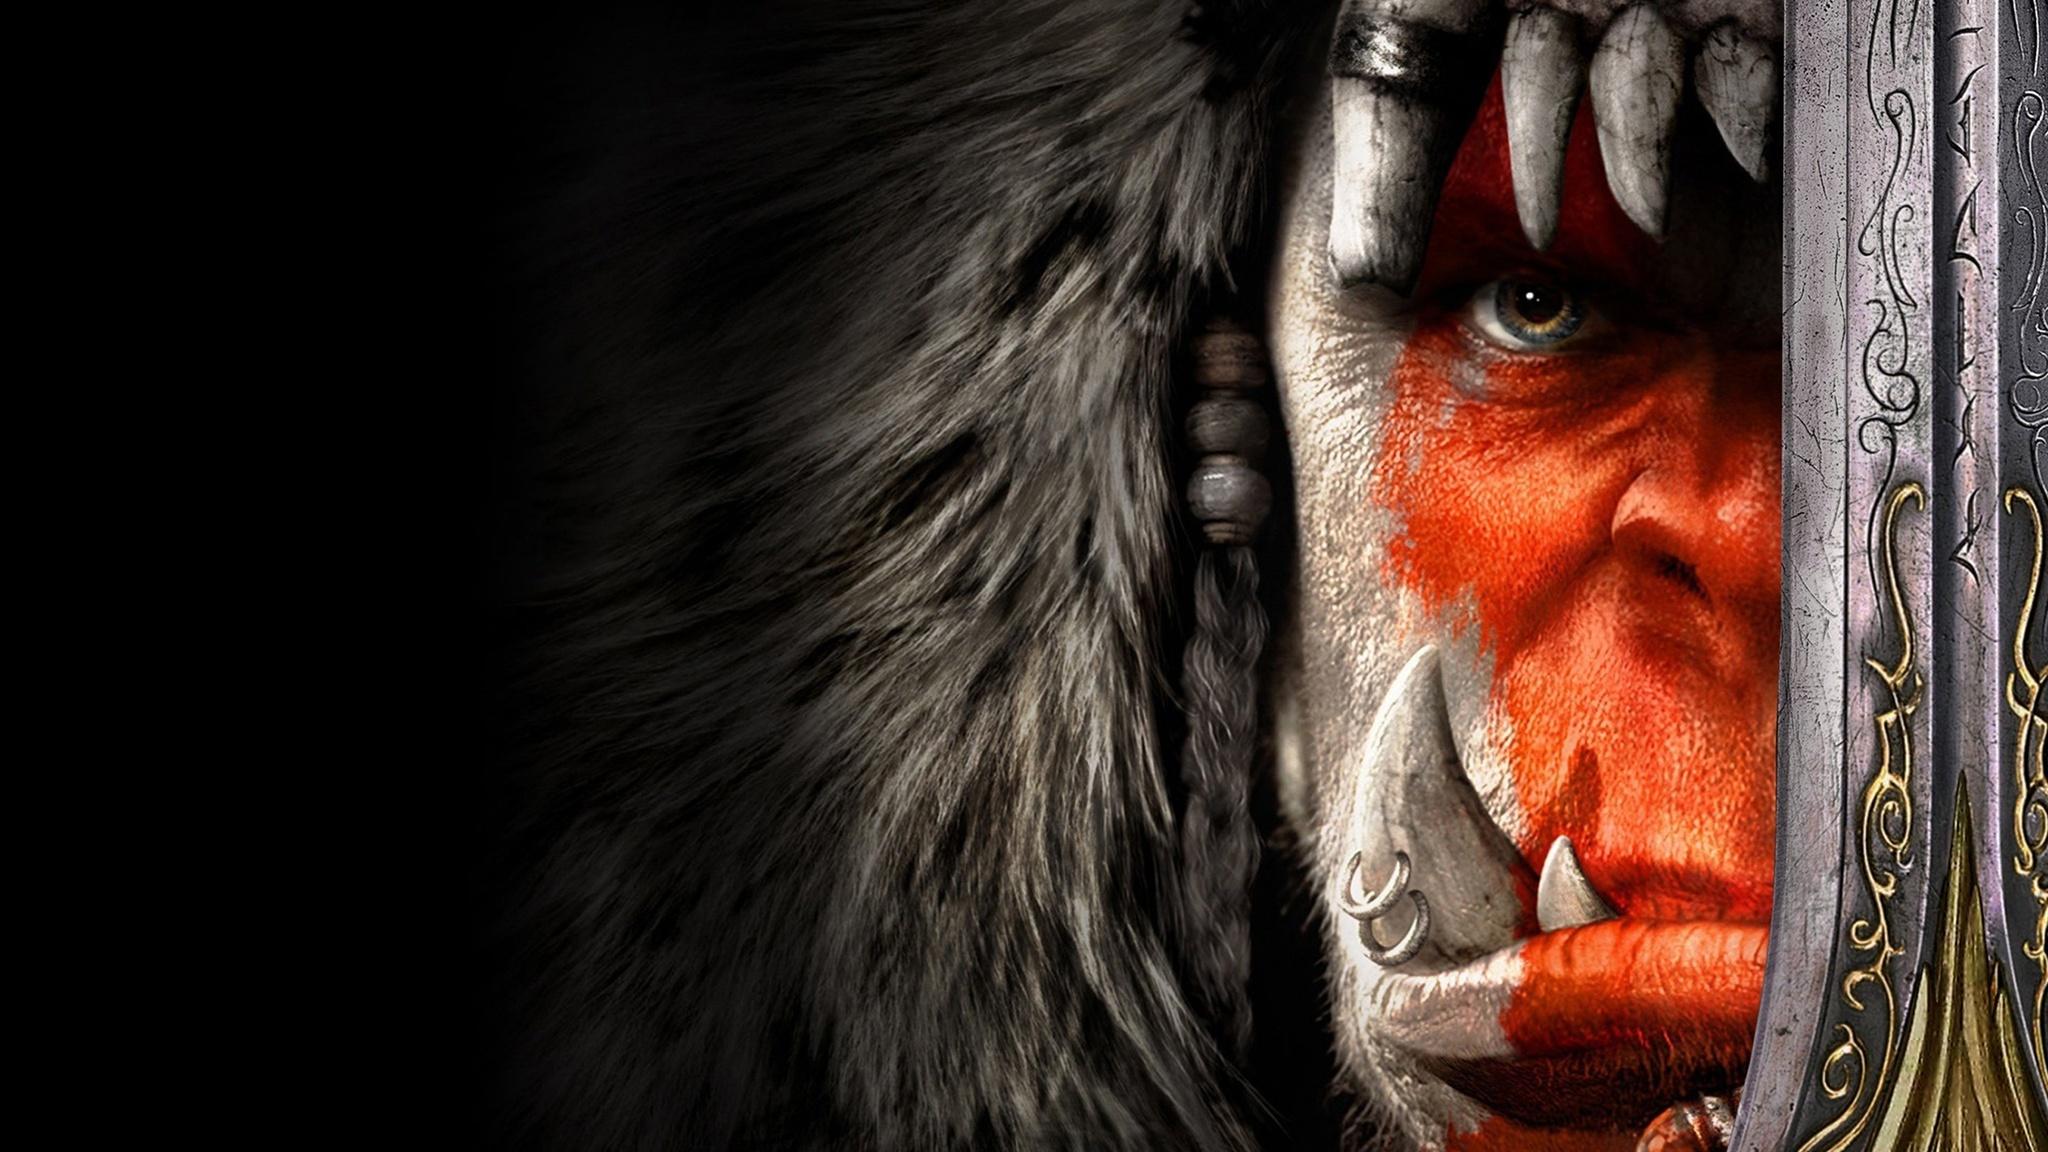 2048x1152 Durotan Orc Warcraft 2048x1152 Resolution Hd 4k